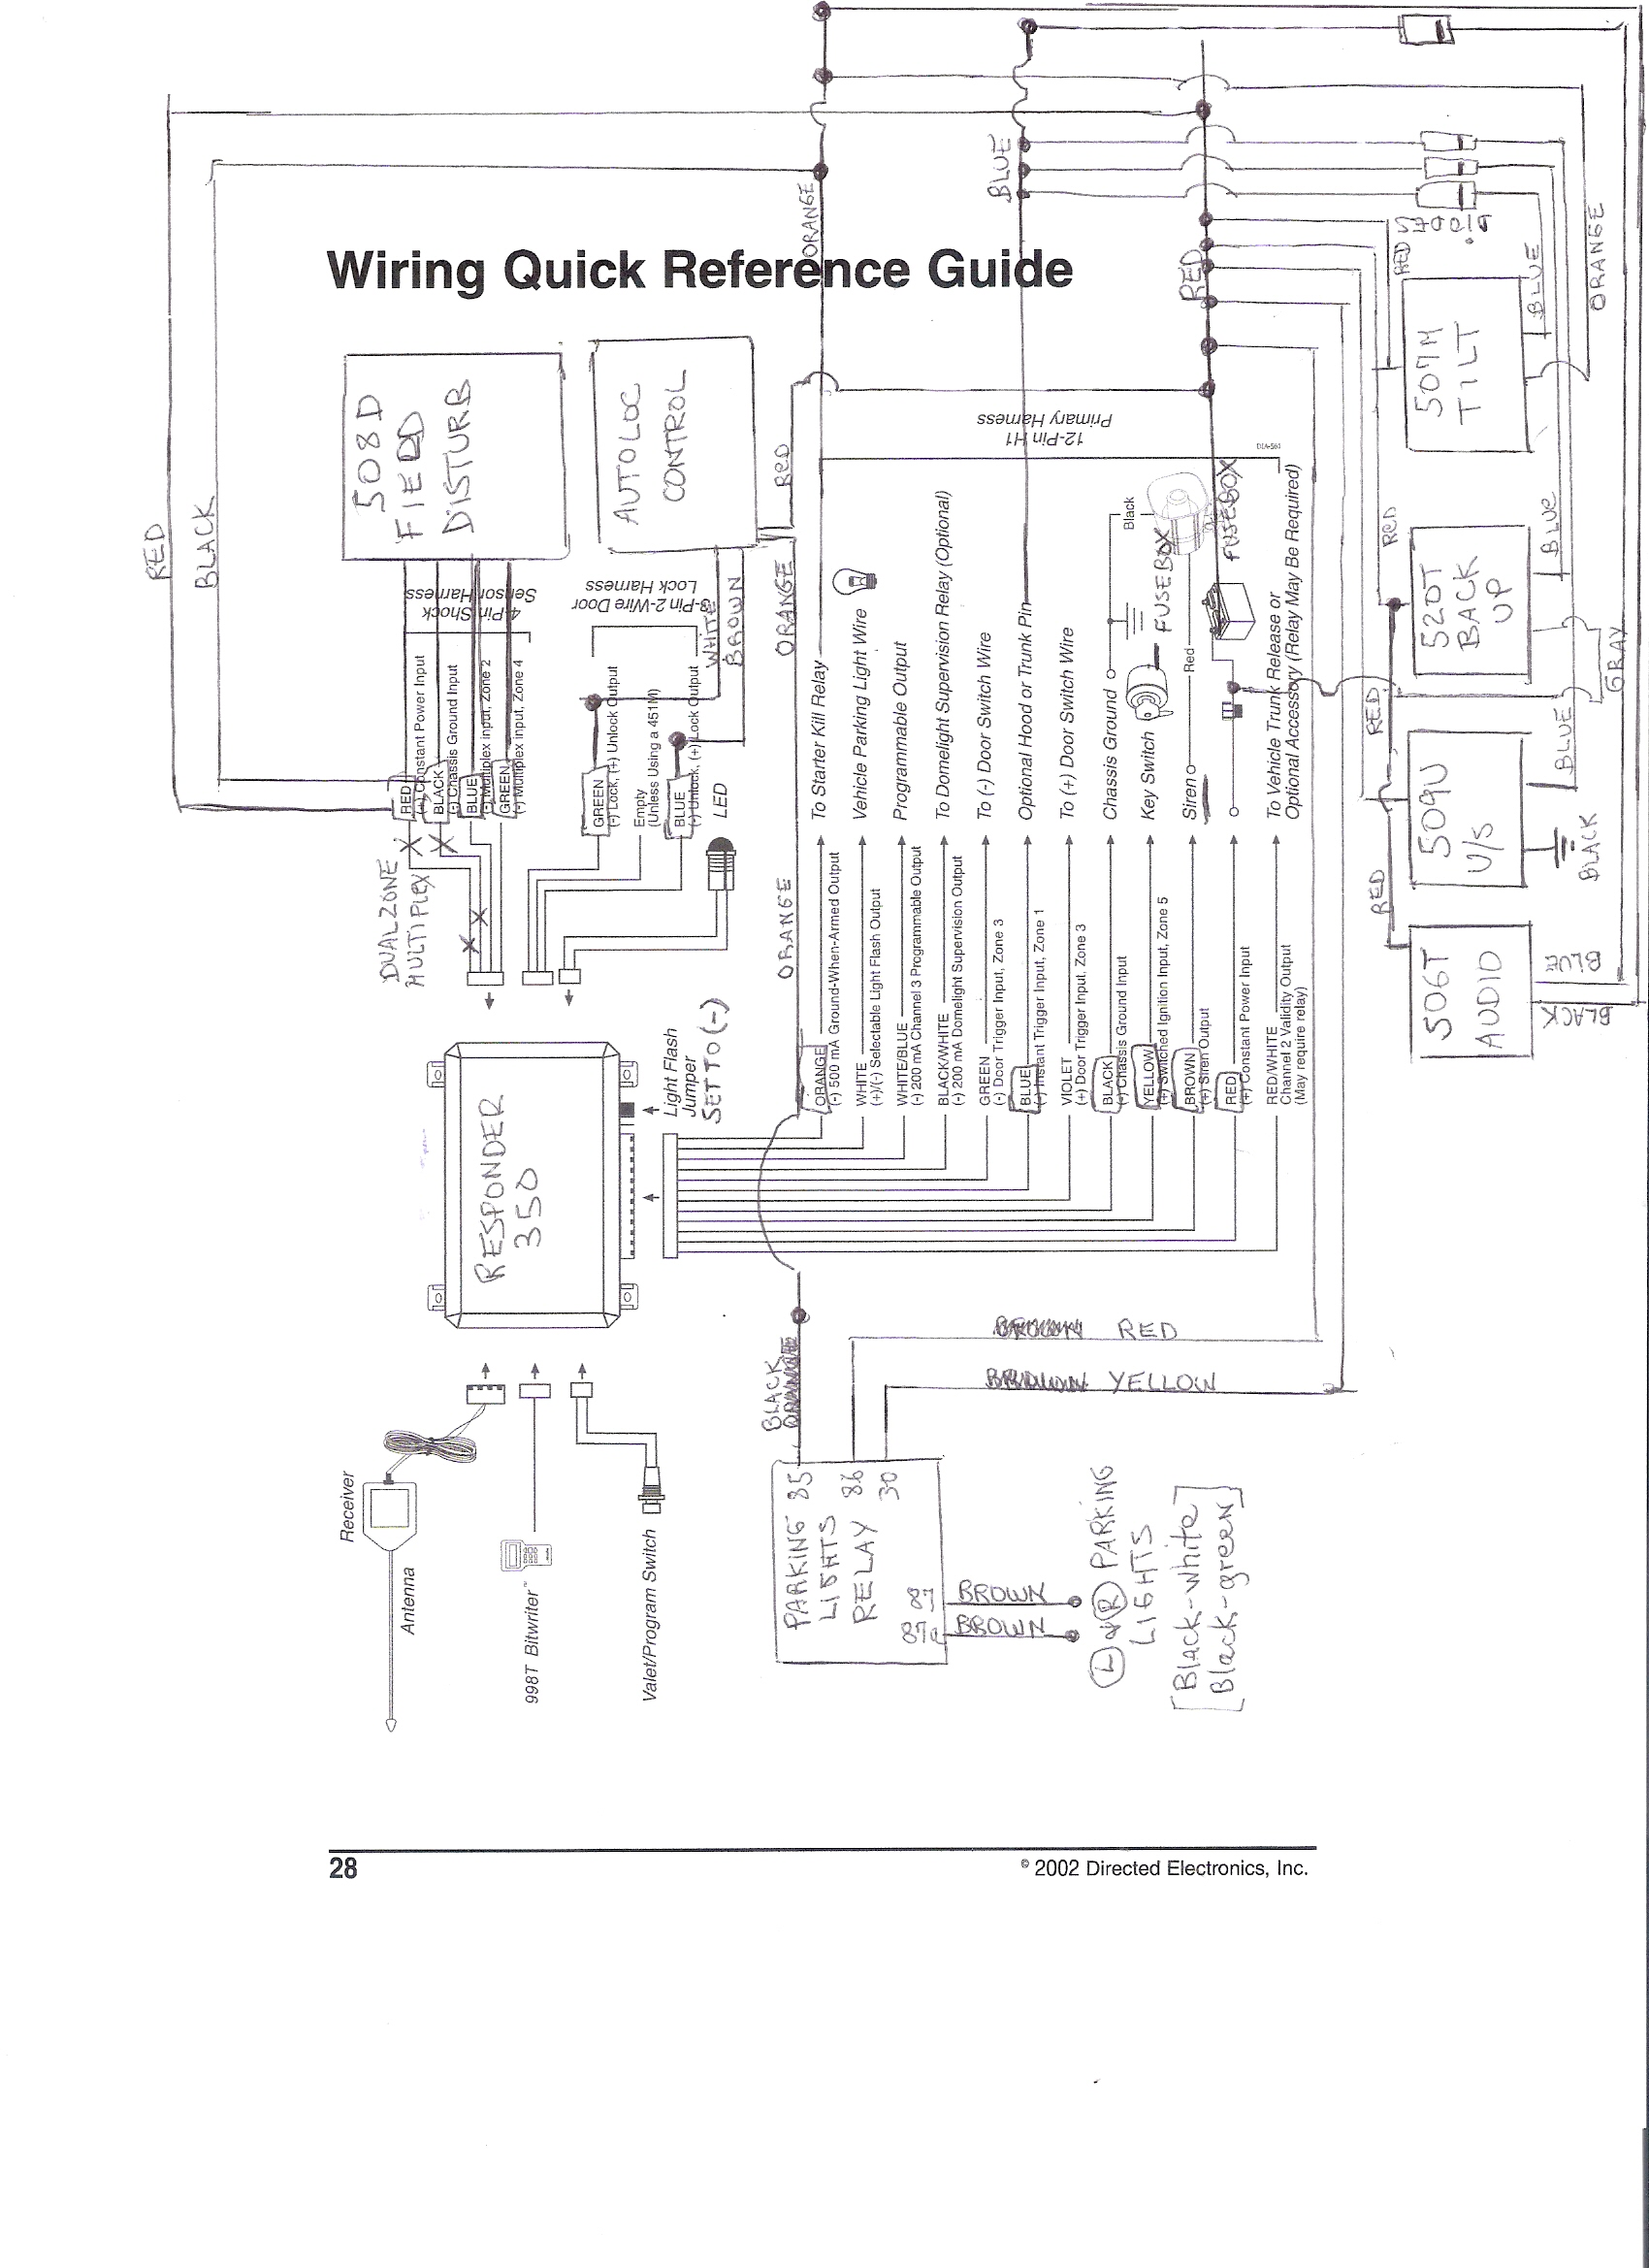 land rover defender central locking wiring diagram